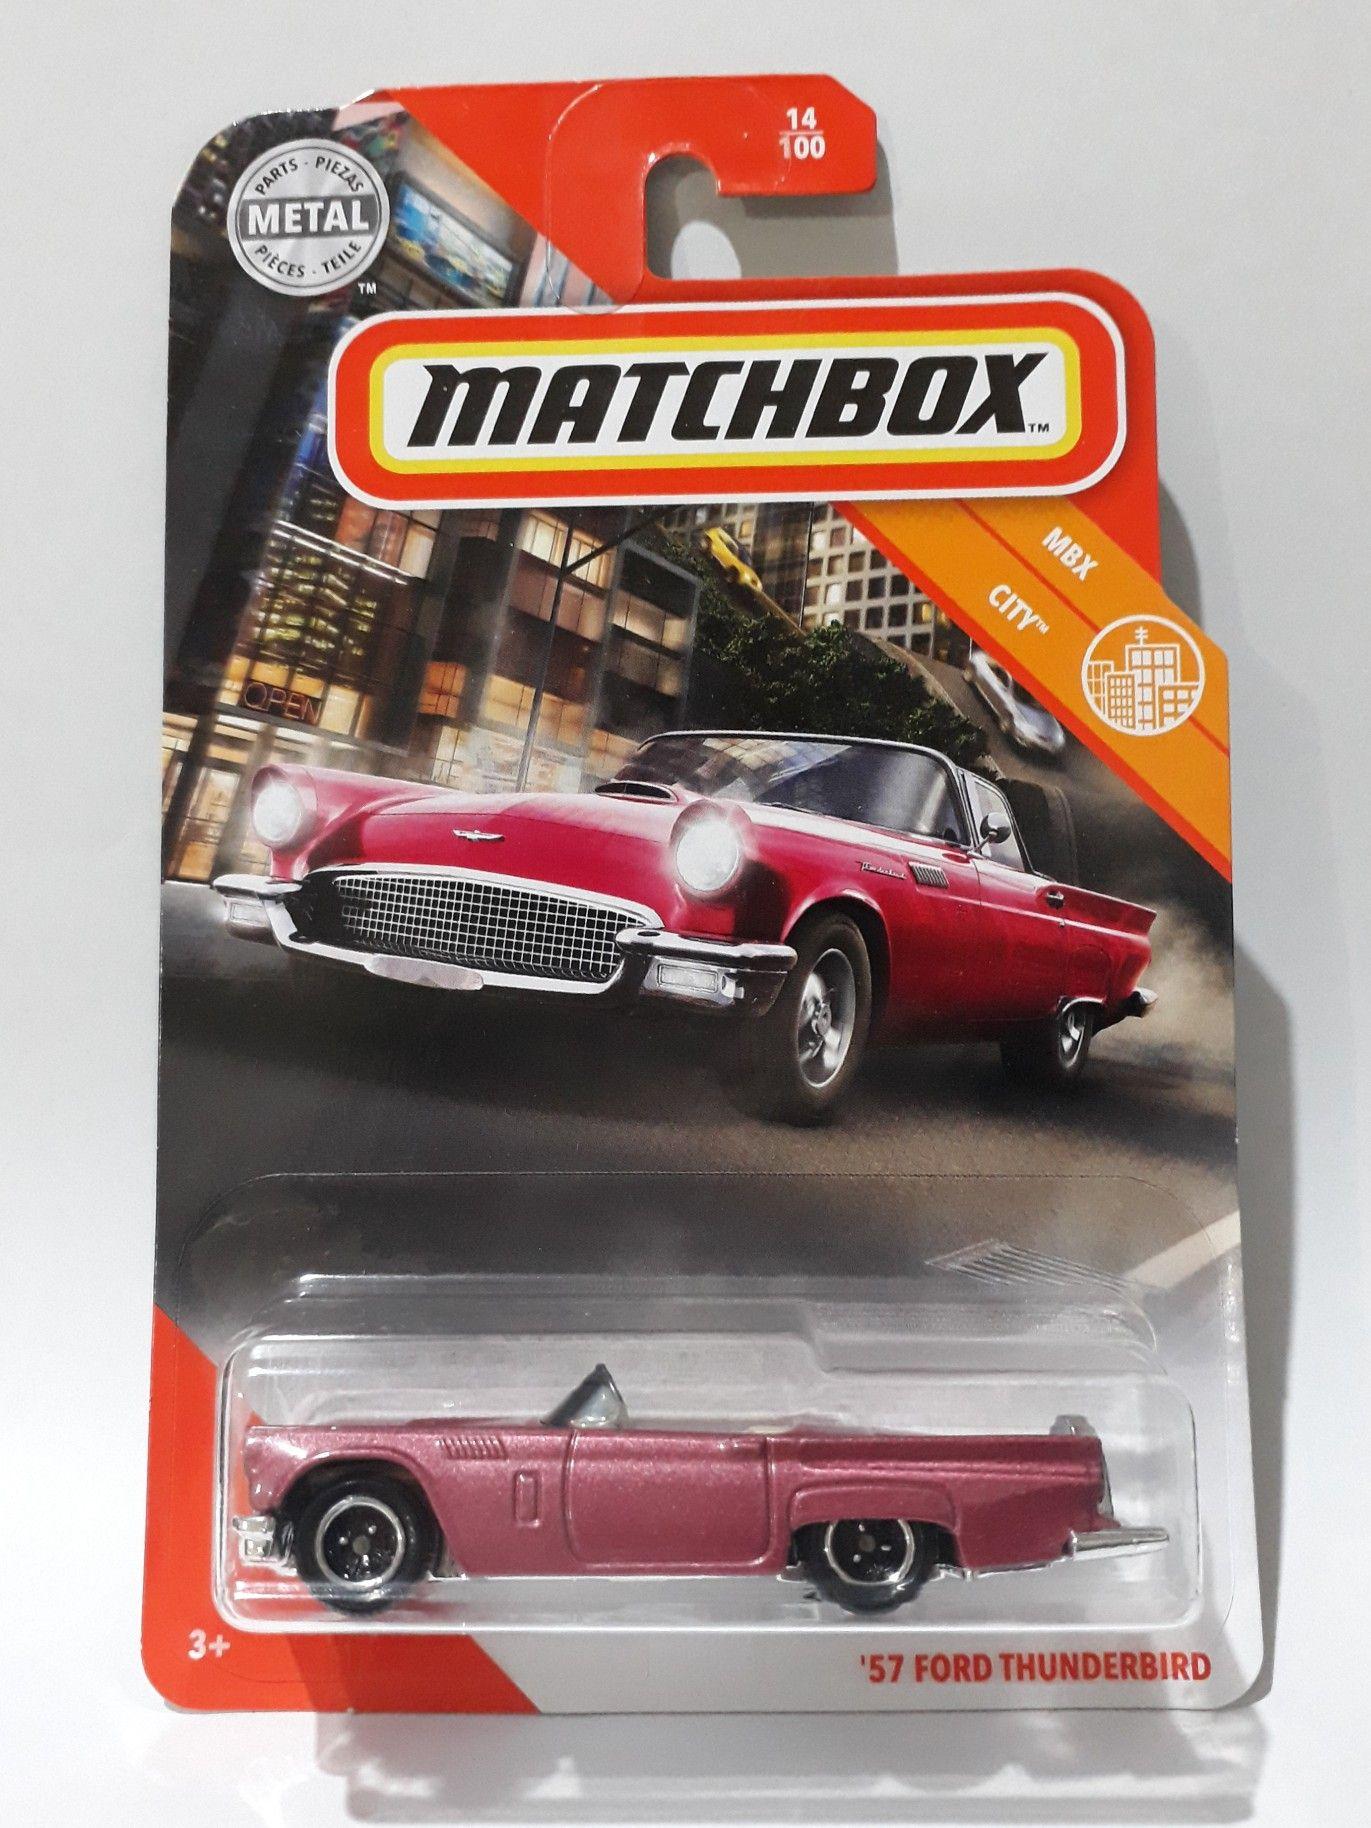 Pin By Pablitos Ruun Ruun On Matchbox Collection Pablitos Ruun Ruun Instagram Matchbox Cars Matchbox Hot Wheels [ 1828 x 1371 Pixel ]